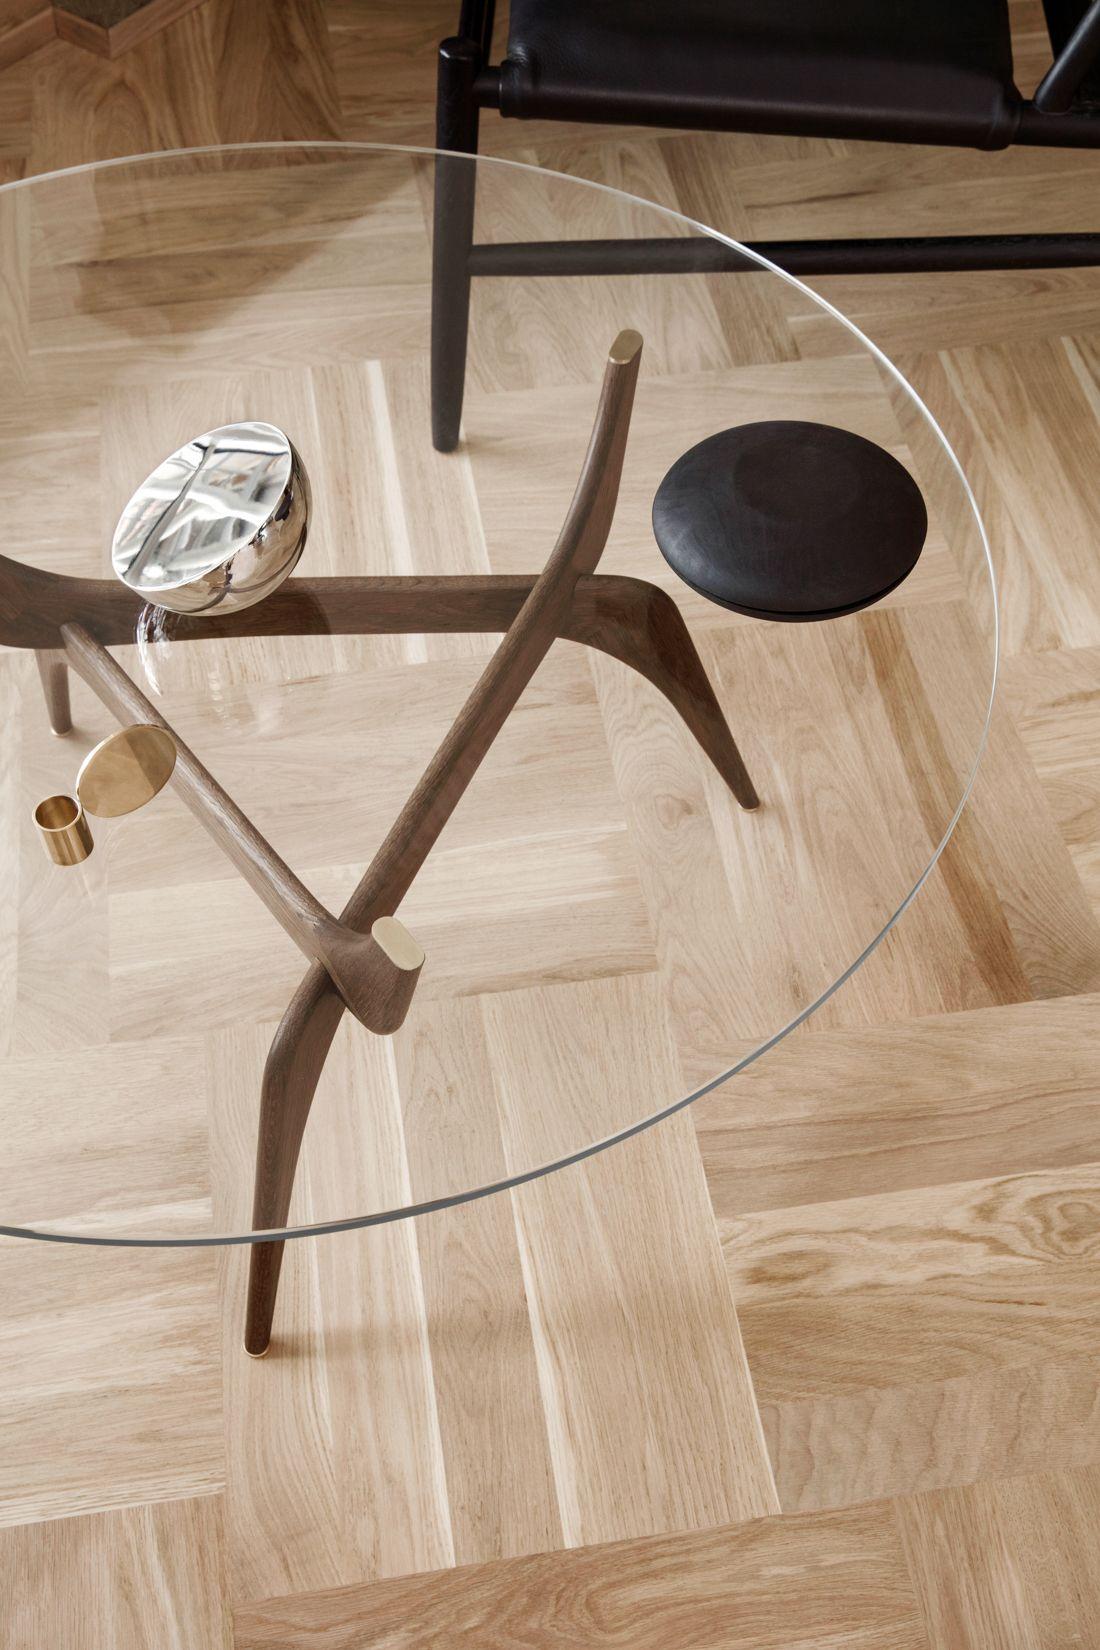 new danish furniture. Brdr. Kruger Launches Two New Danish Designs: TRIIIO + THEODOR - Design Milk Furniture